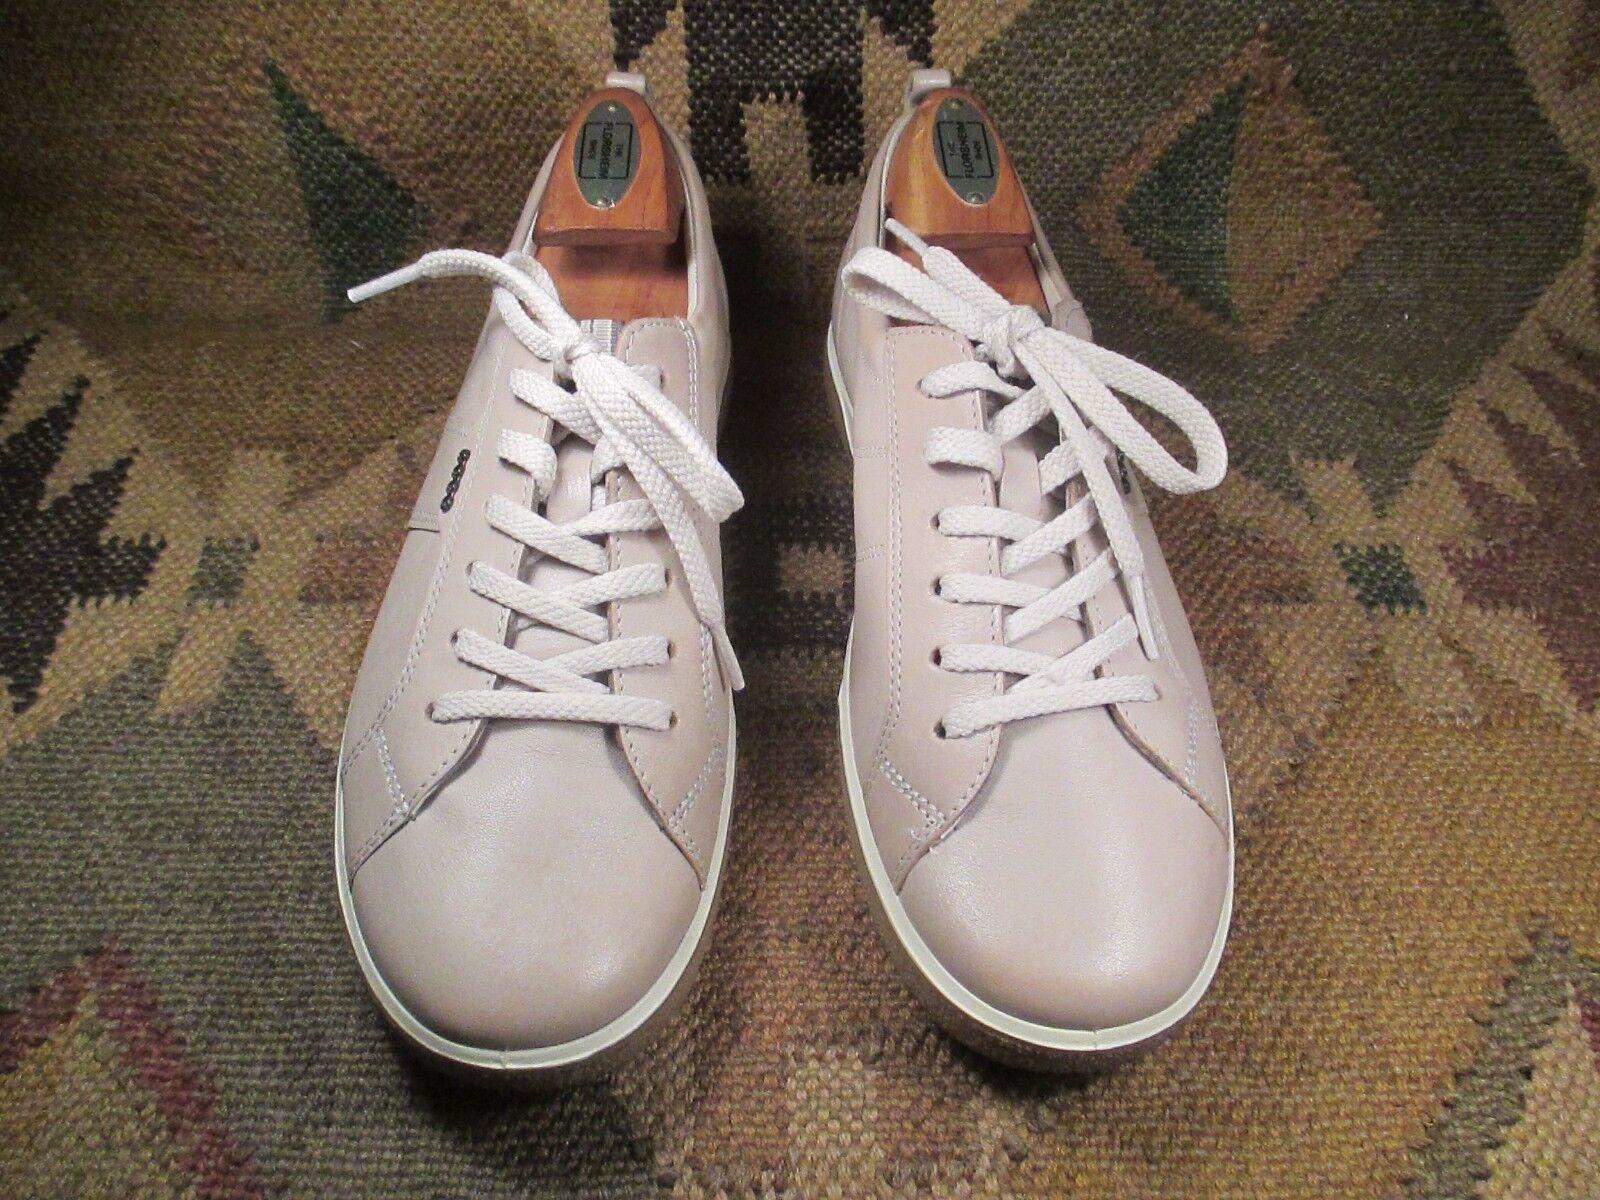 Beige ECCO Lace Up Soft Fashion Light Beige  Leather Sneakers, 200e4e